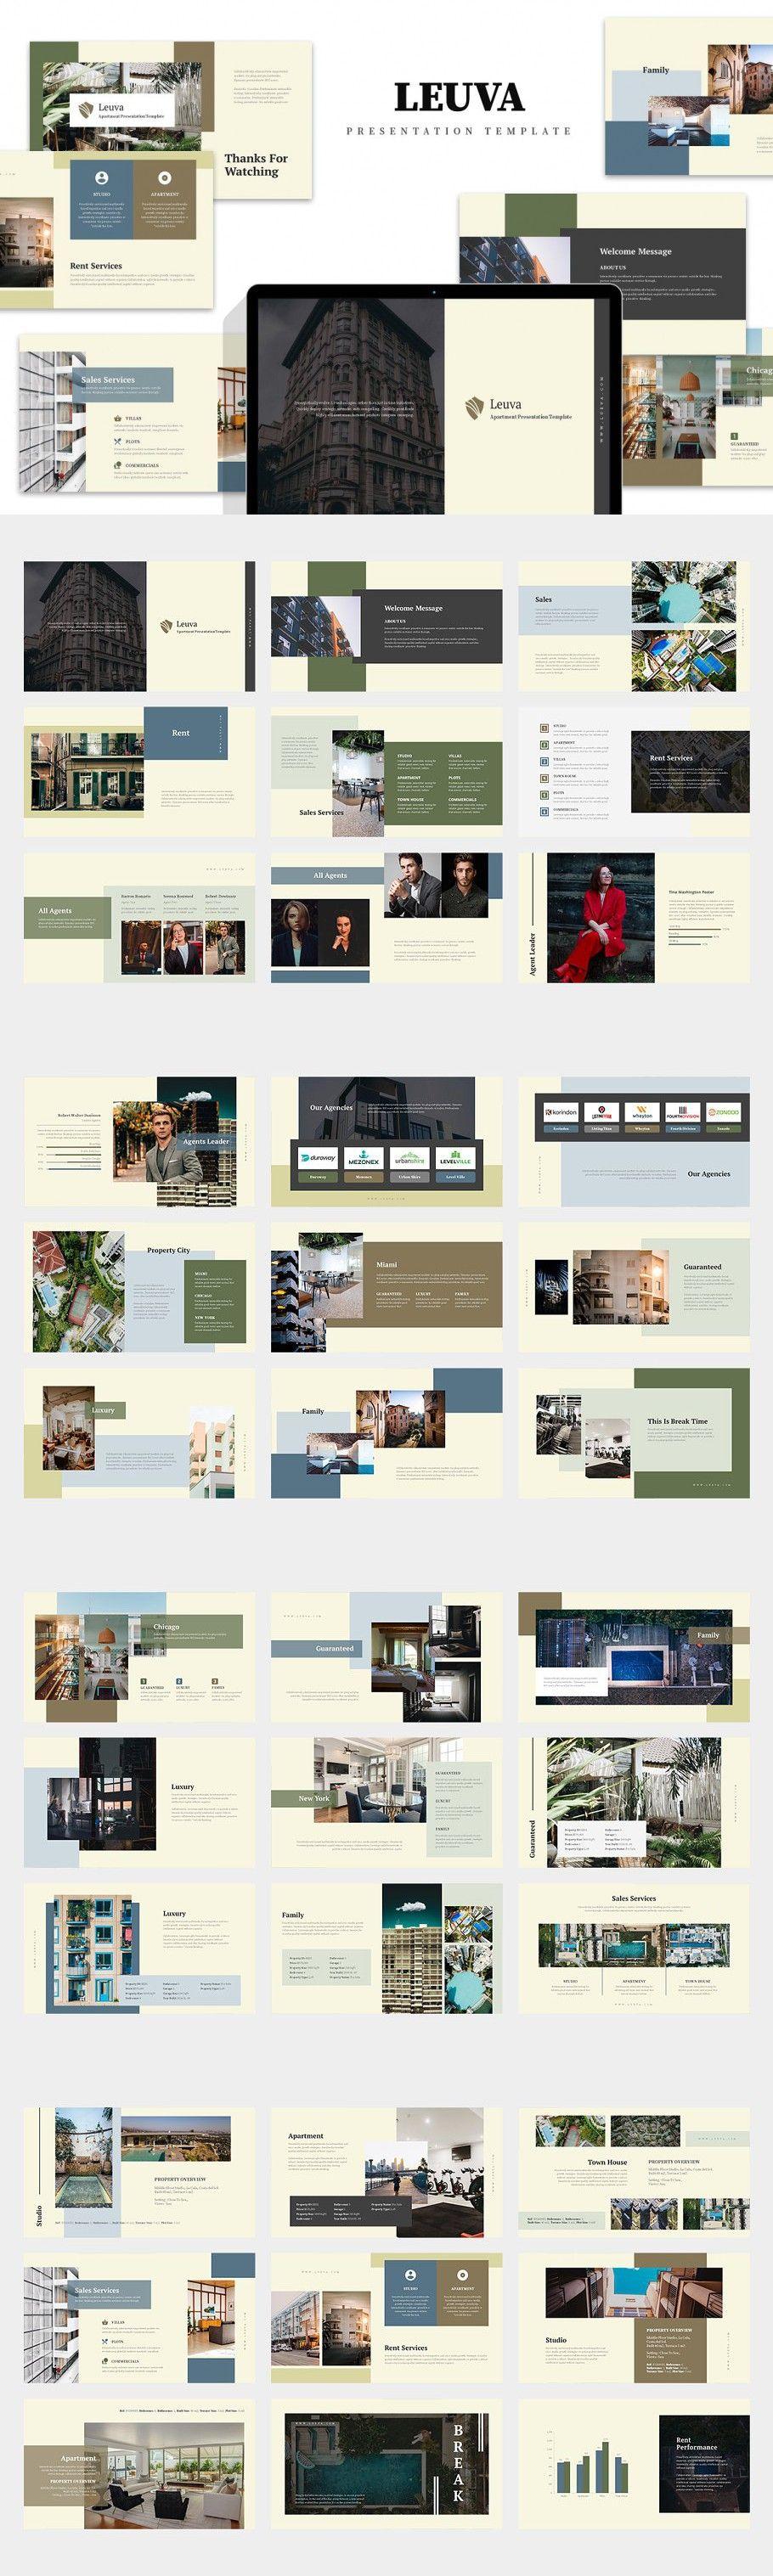 Lueva : Apartment Agent Keynote in 2020 | Presentation ...